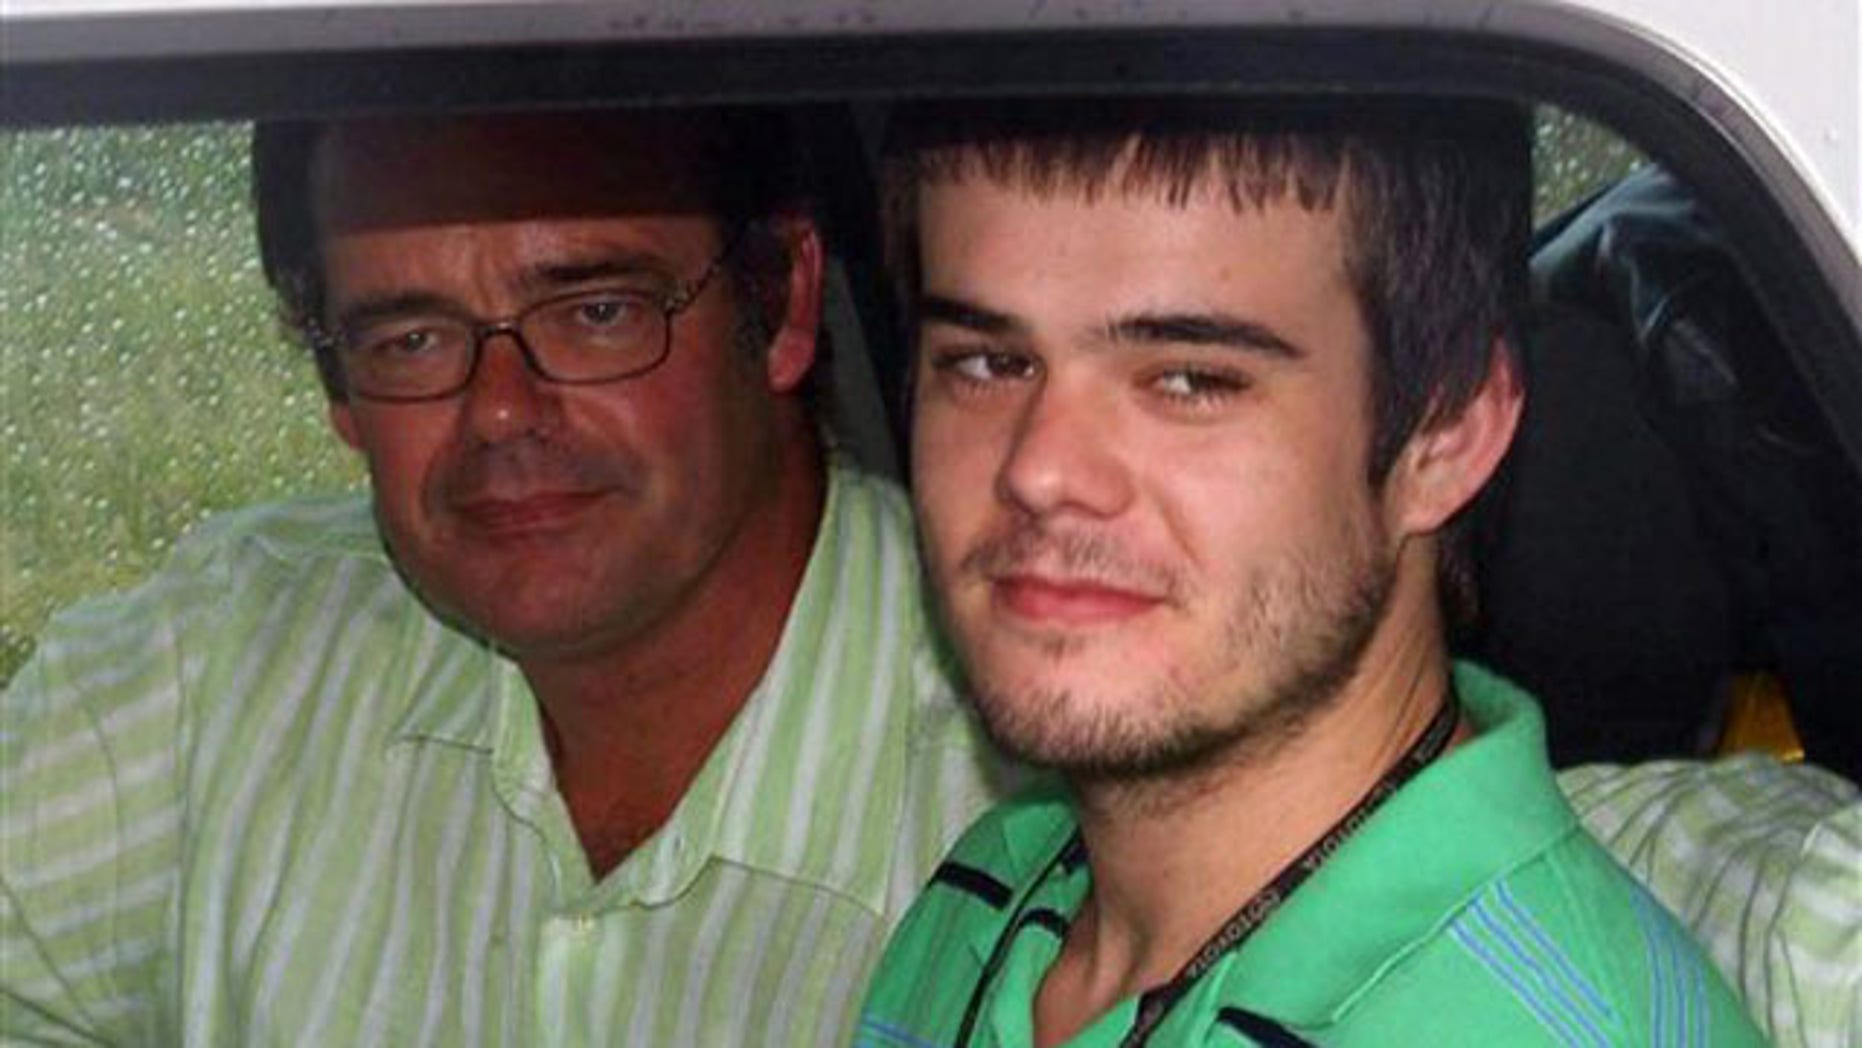 December 7, 2007  Joran van der Sloot, right, sits with his father, Paulus Van Der Sloot, after Joran after being released from custody near Oranjestad, Aruba. (AP)